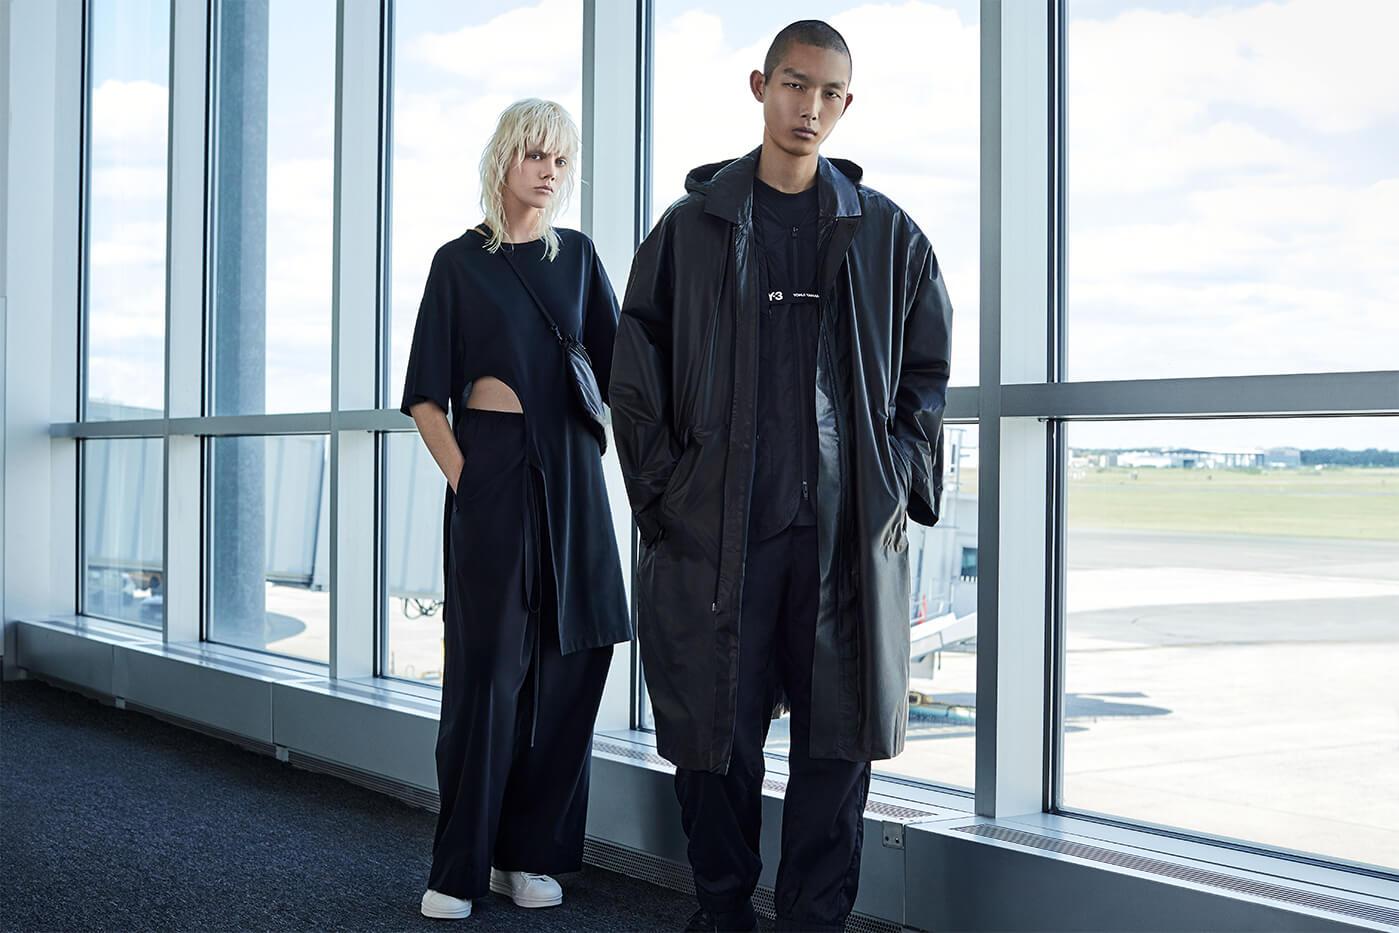 adidas-y3-johan-sandberg-airport-04